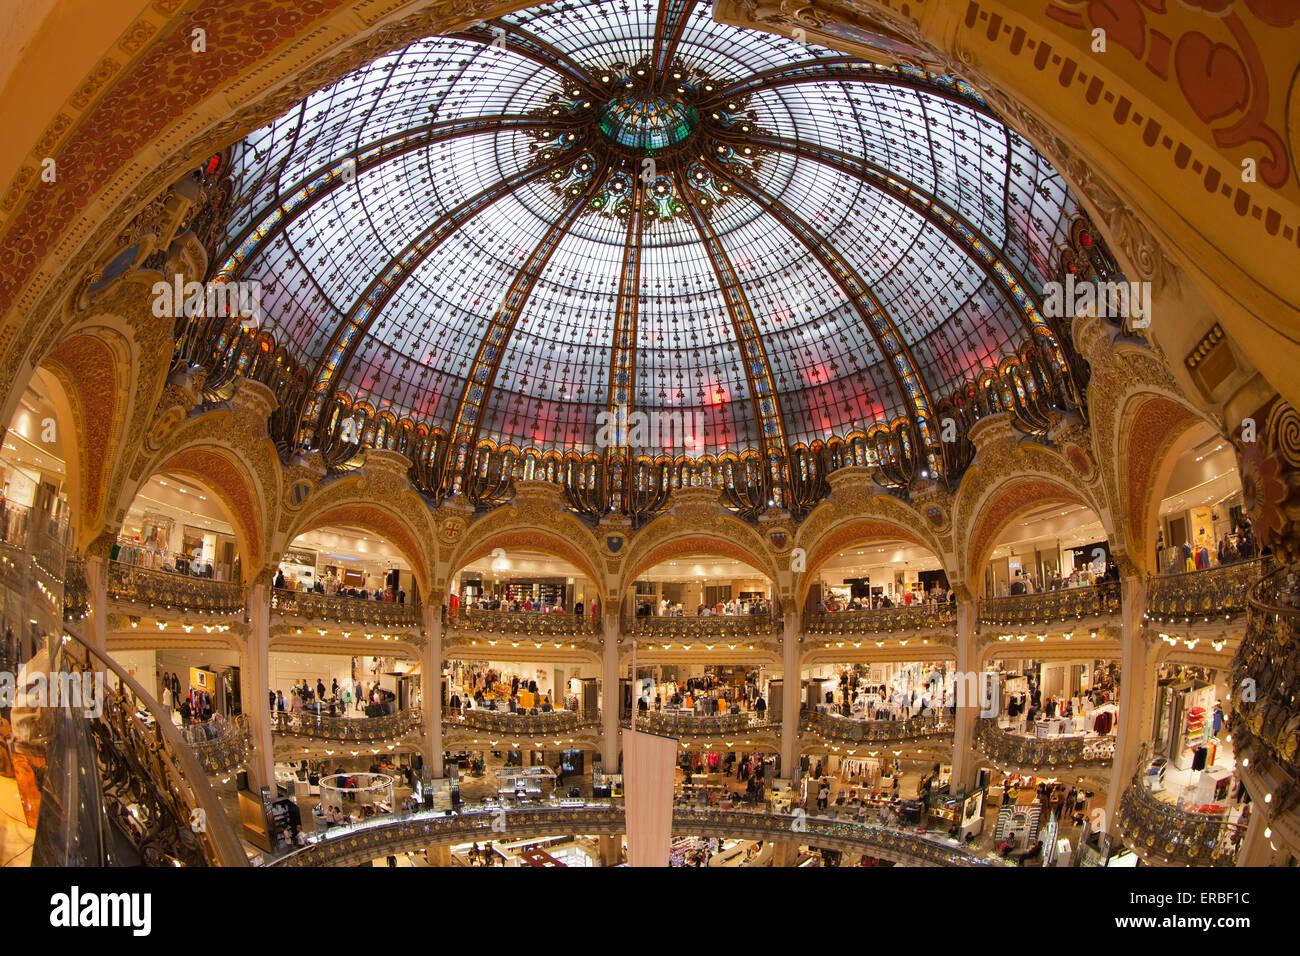 The Galeries Lafayette, Paris, France. - Stock Image